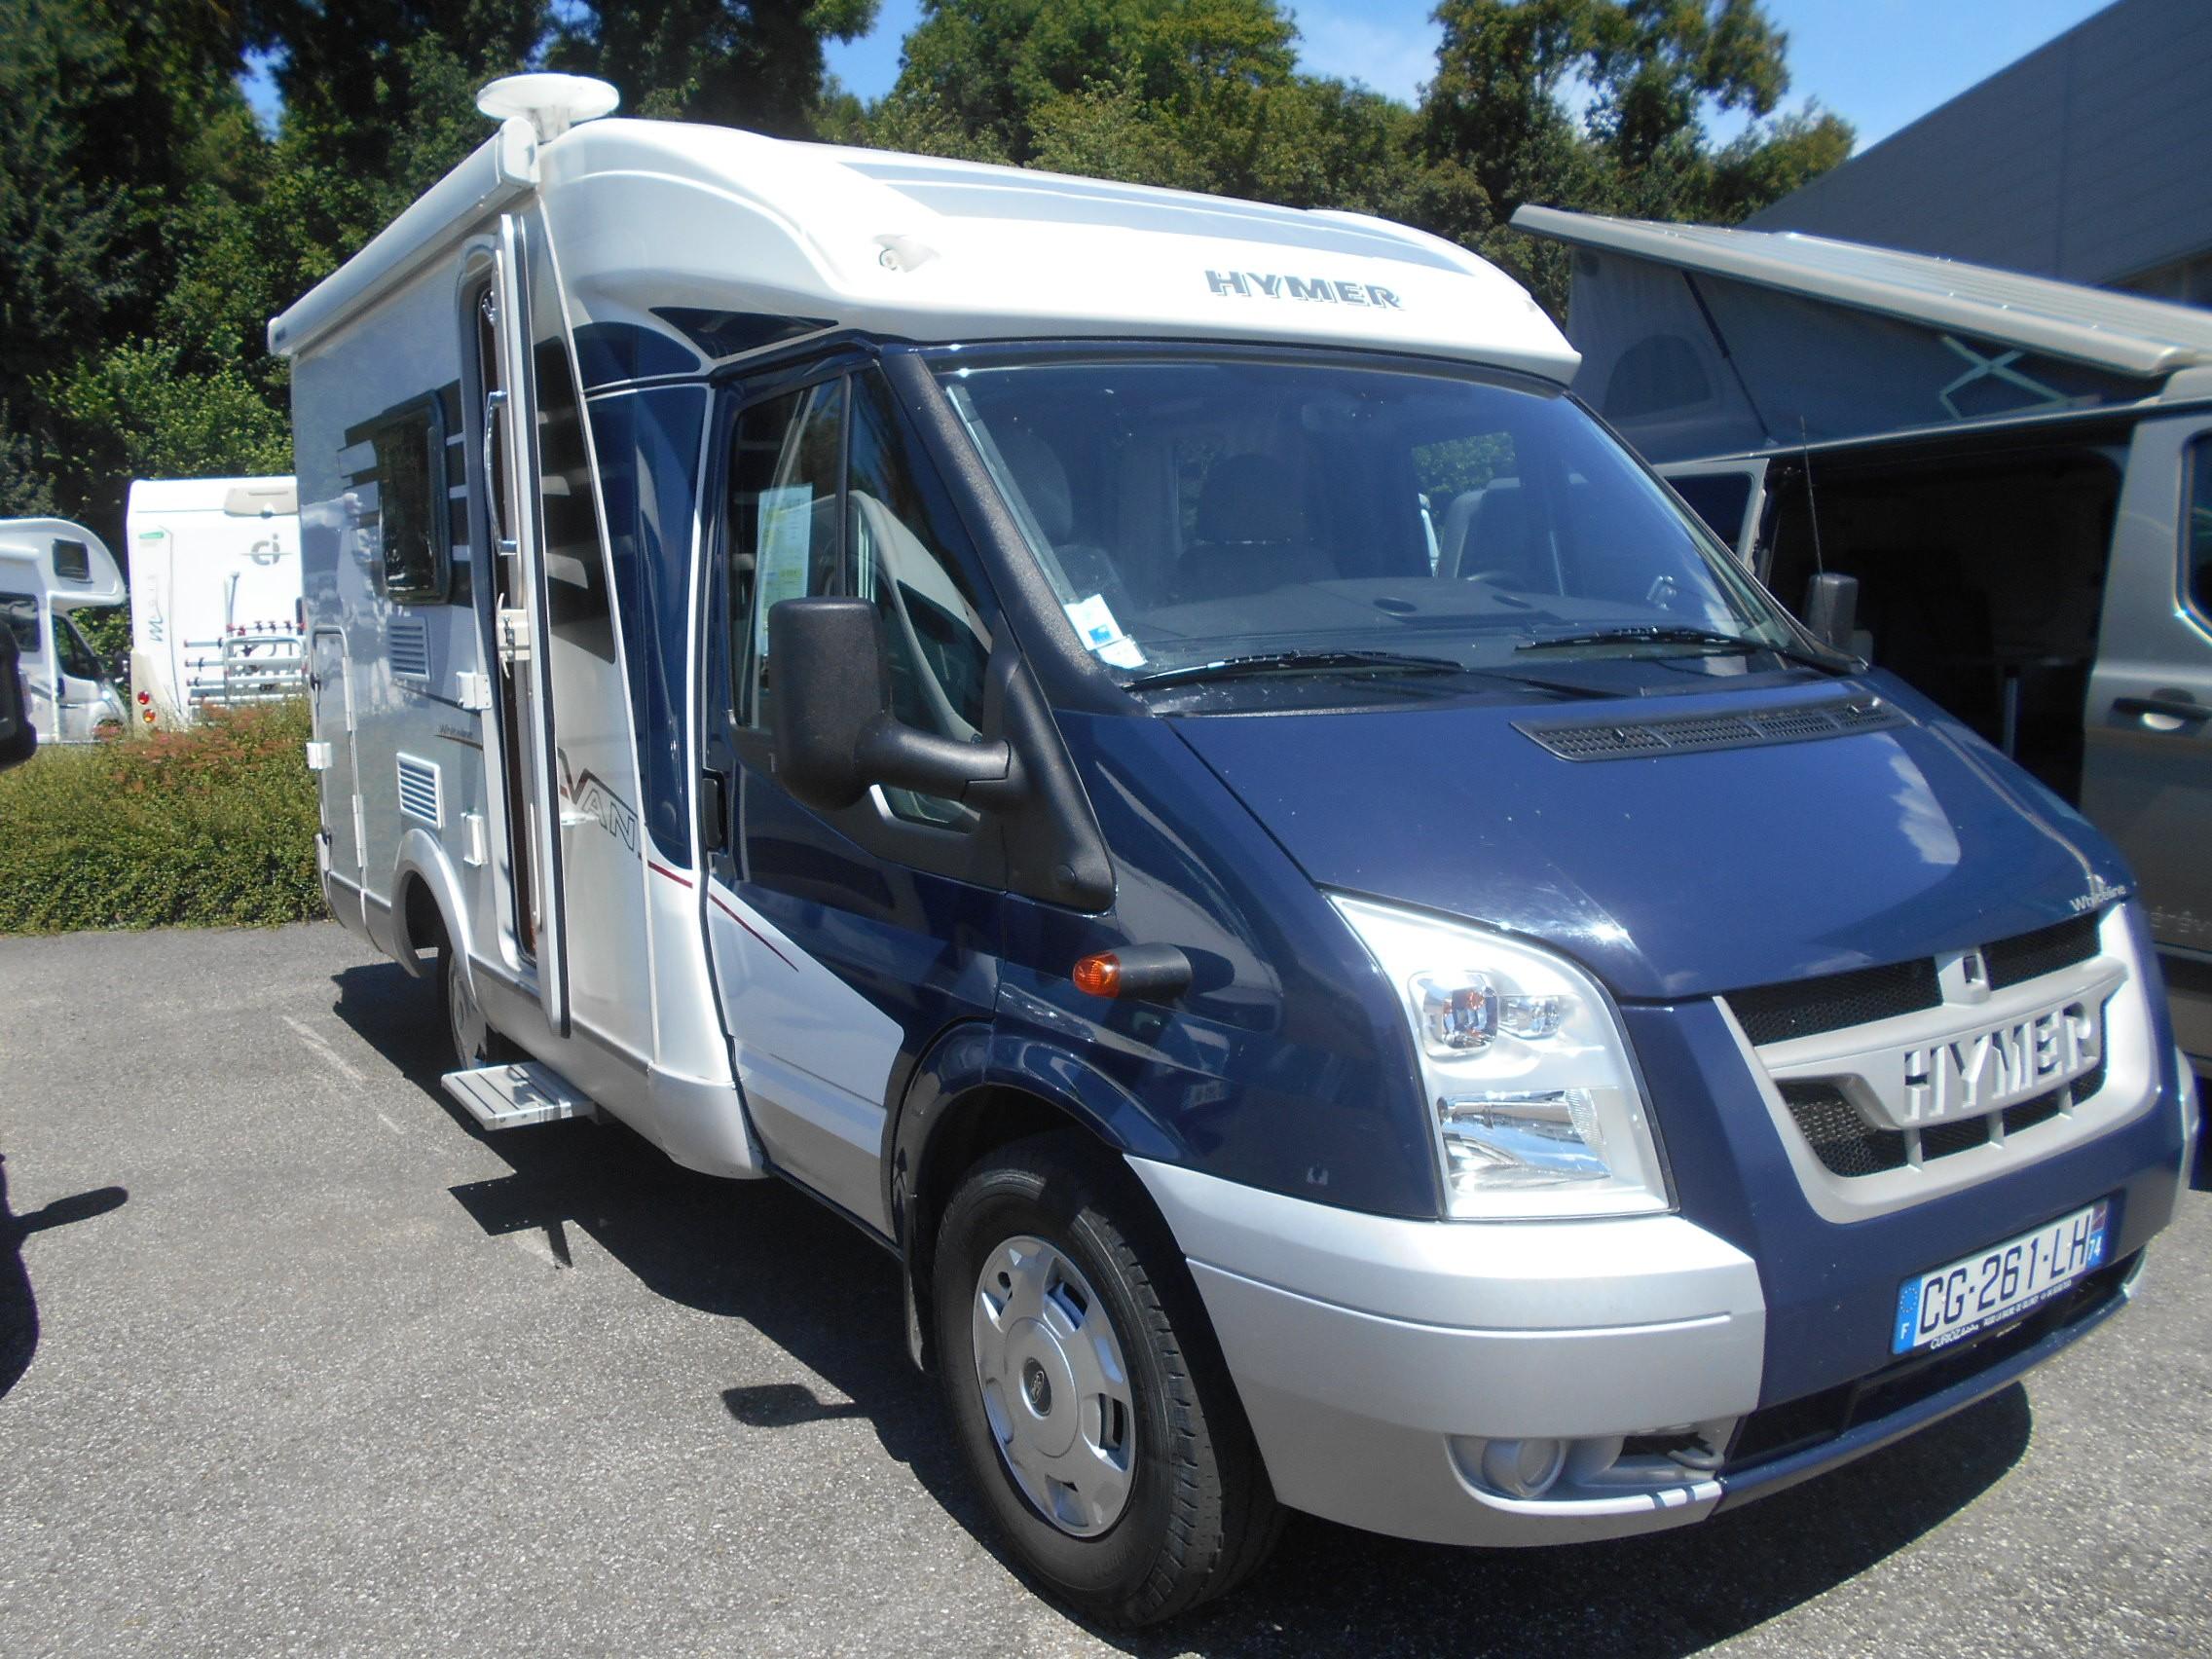 hymer van 512 occasion de 2012 ford camping car en vente la balme de sillingy haute savoie. Black Bedroom Furniture Sets. Home Design Ideas